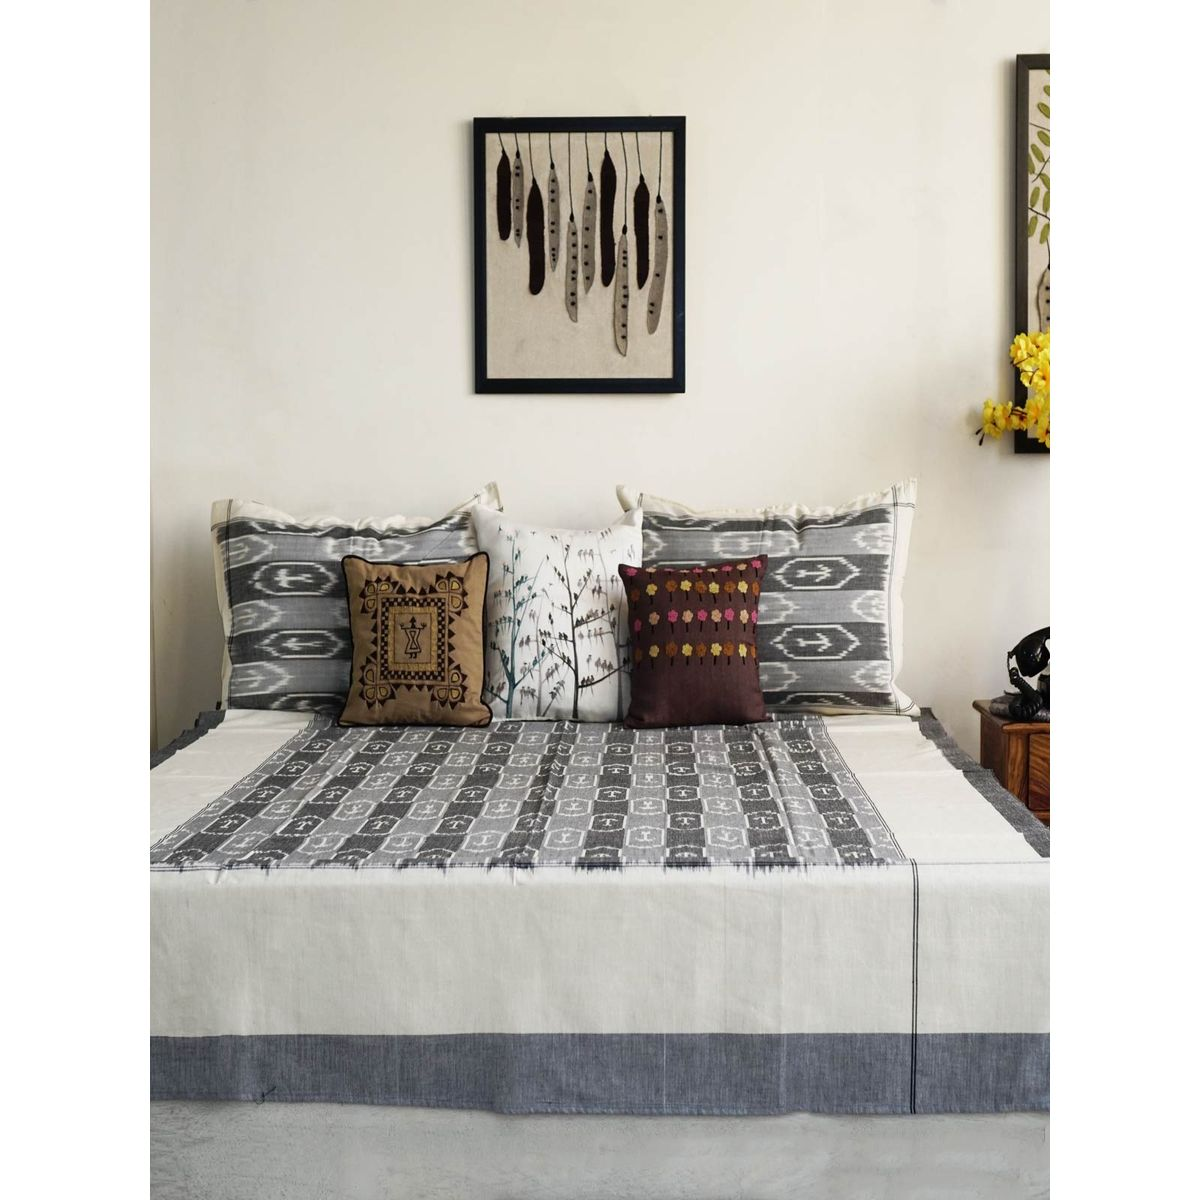 Nalin Single Bedsheet with Pillow Cover